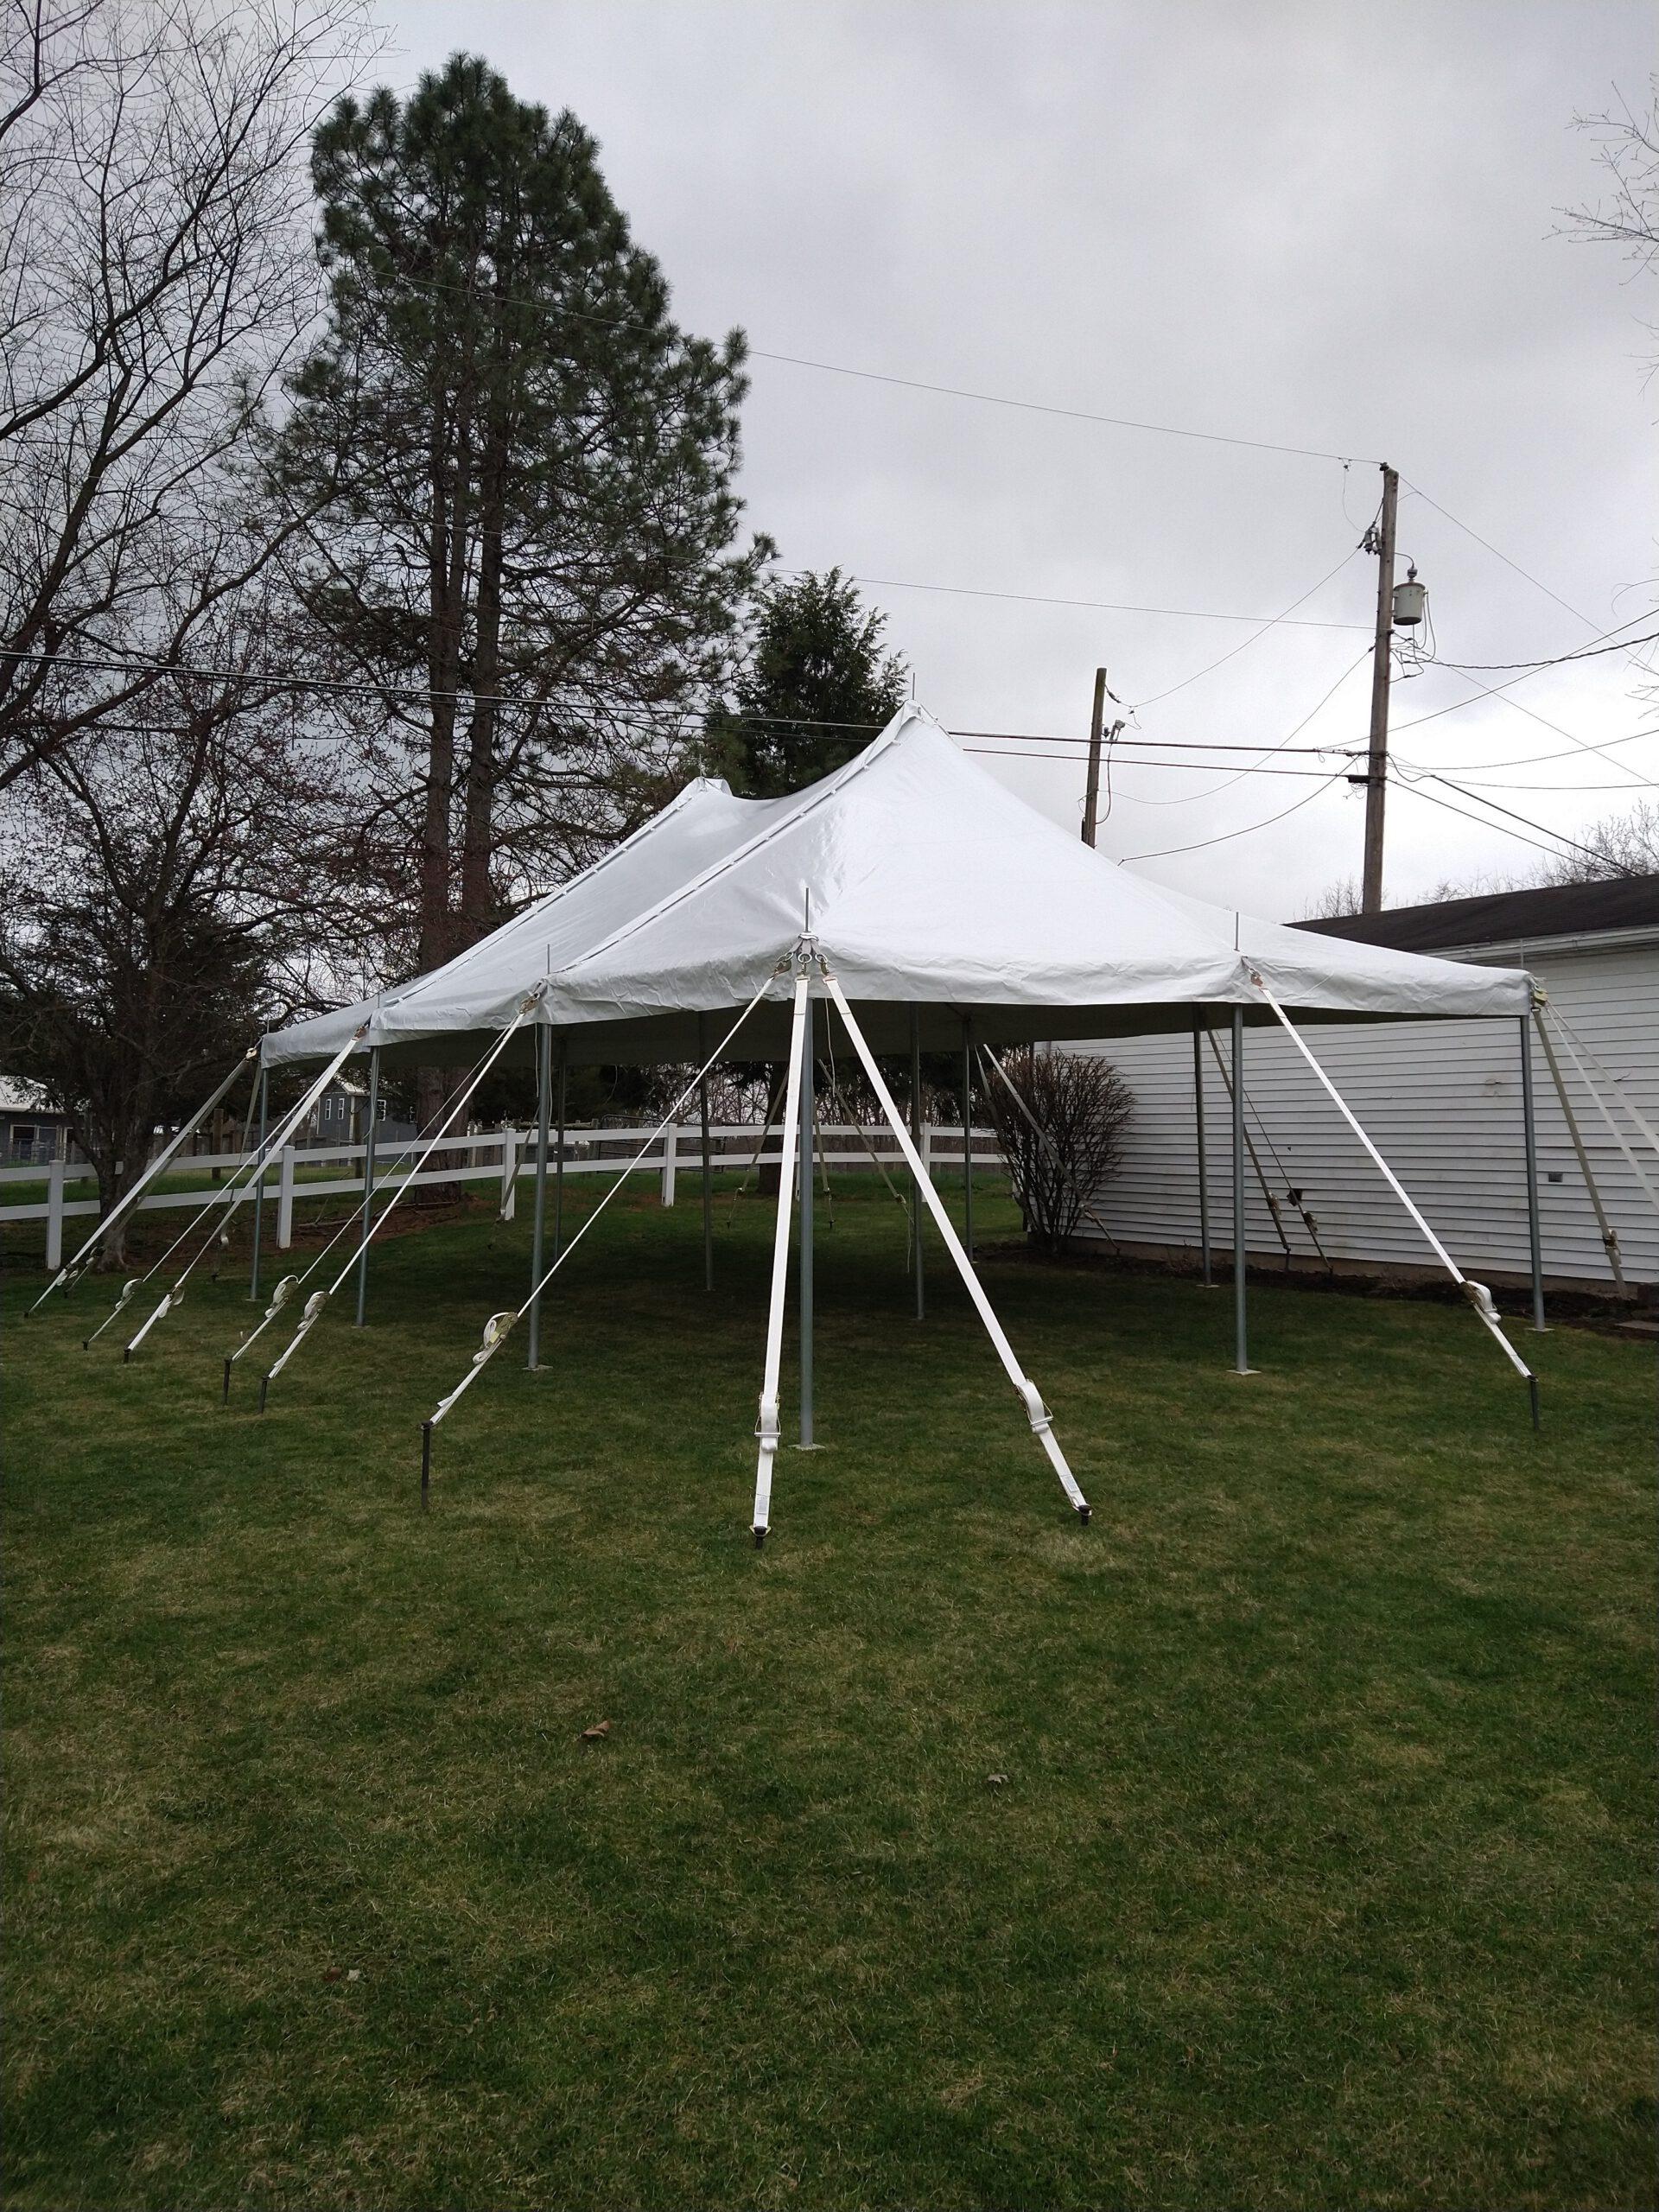 Image of 20x30 Pole Tent Rental